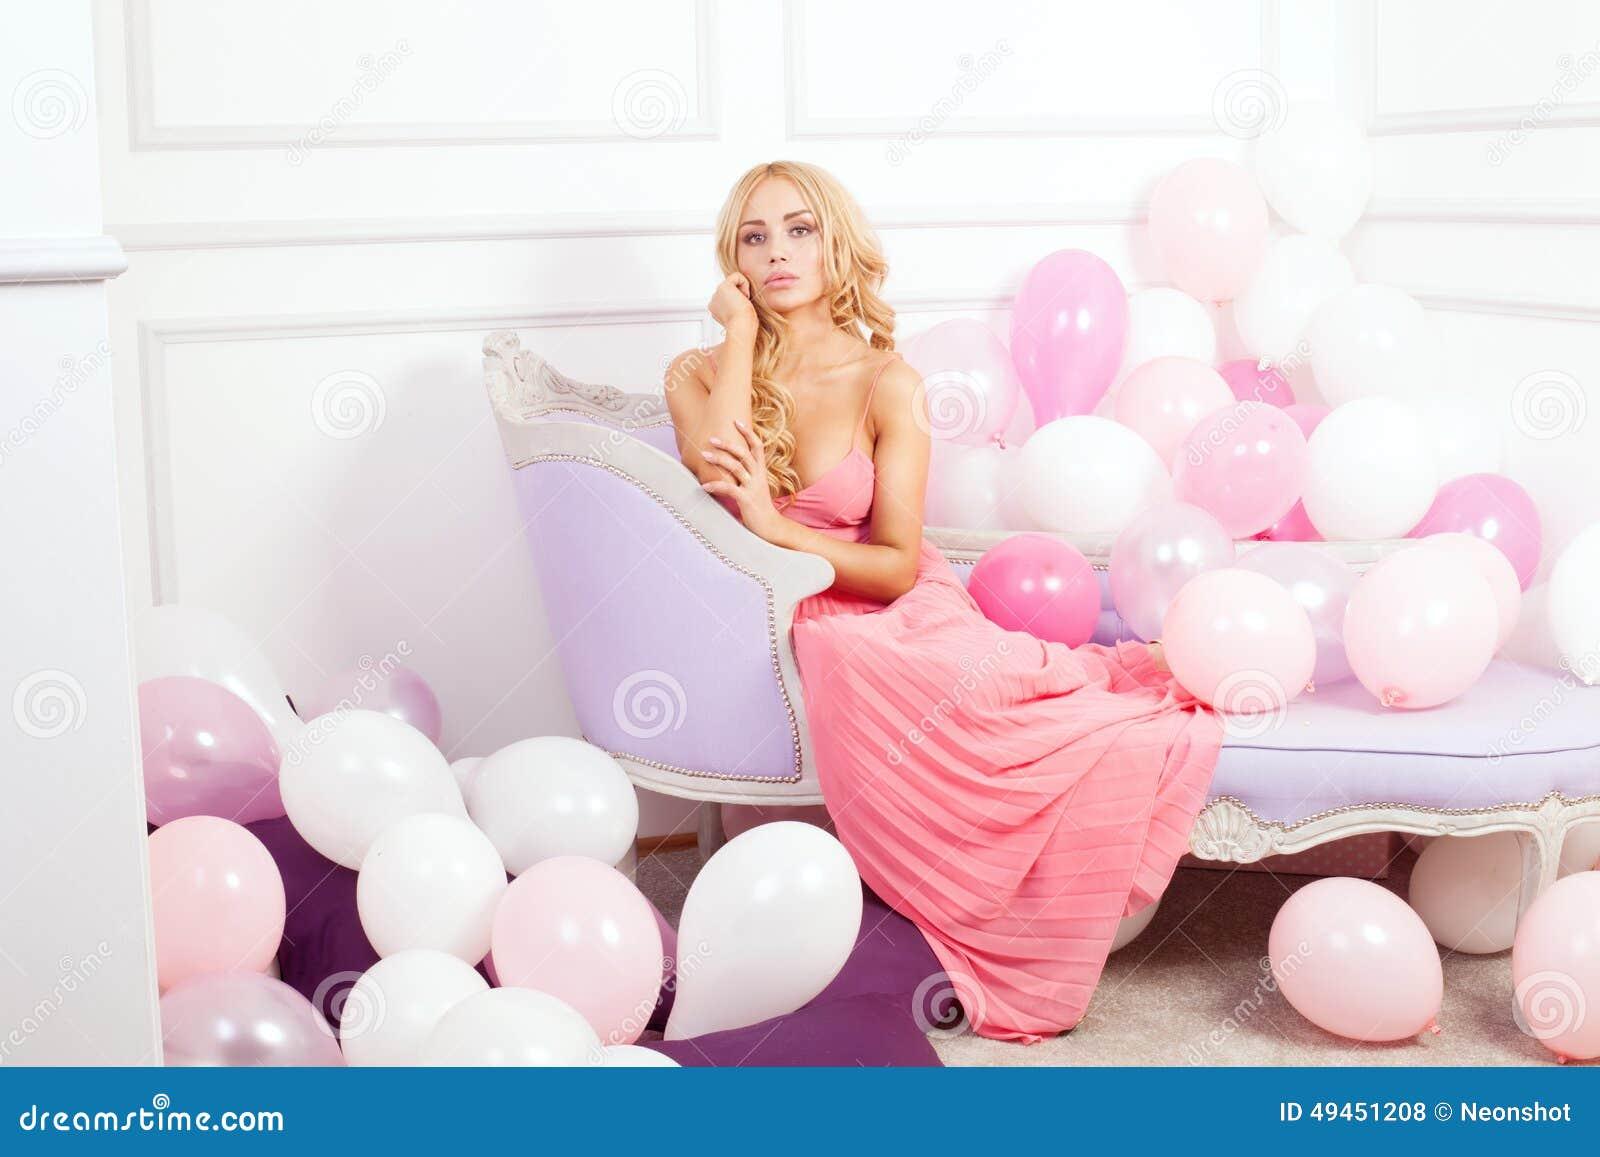 Romantic blonde woman posing